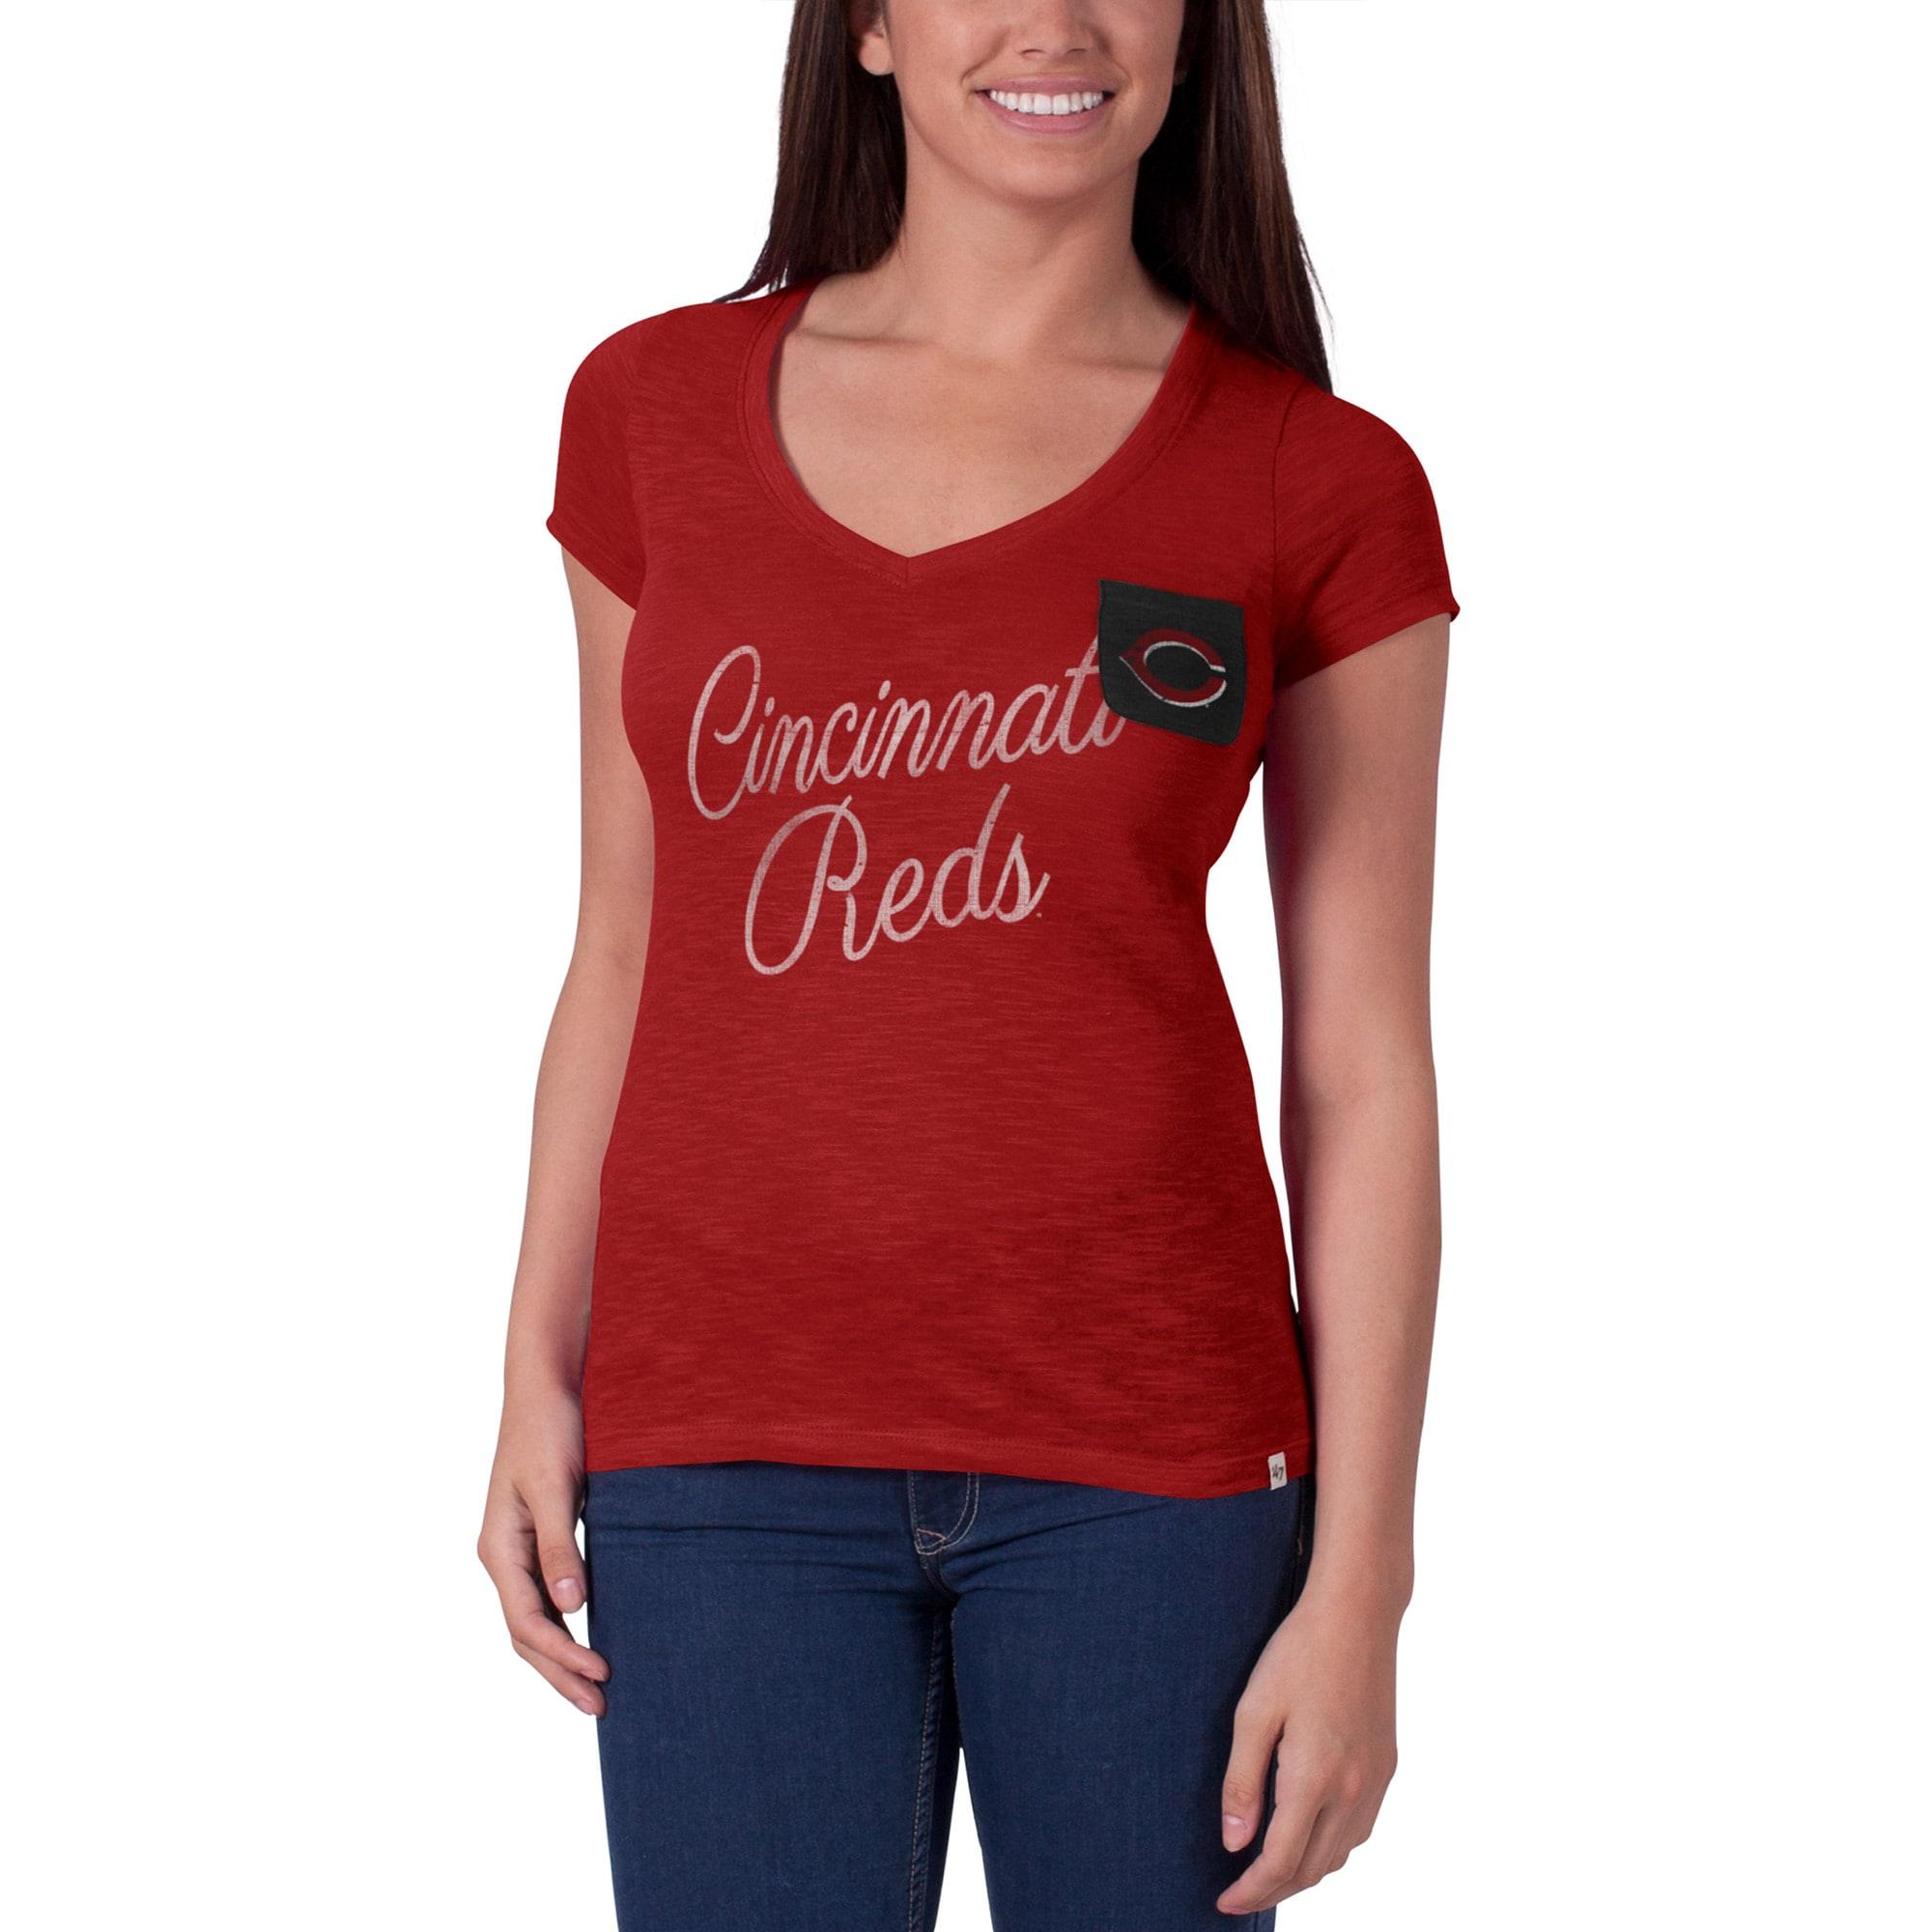 Cincinnati Reds '47 Women's Harbour V-Neck Pocket T-Shirt - Red